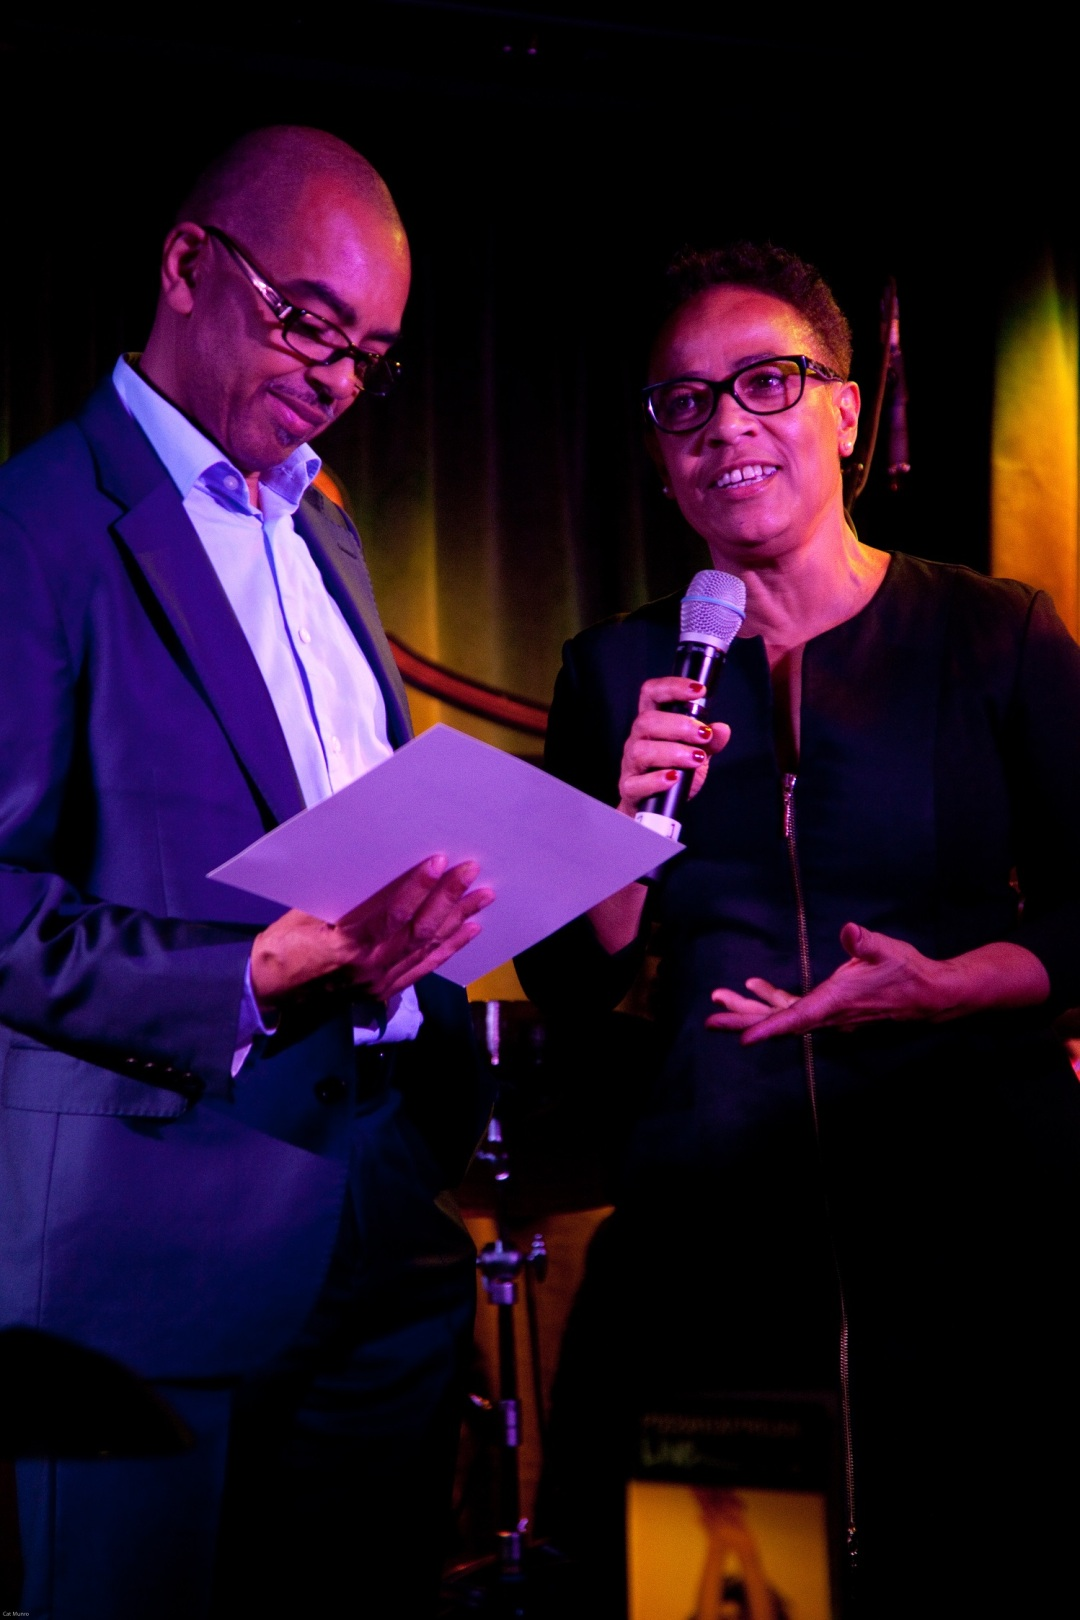 Gary Crosby and Janine Irons - Parliamentary Awards 2017